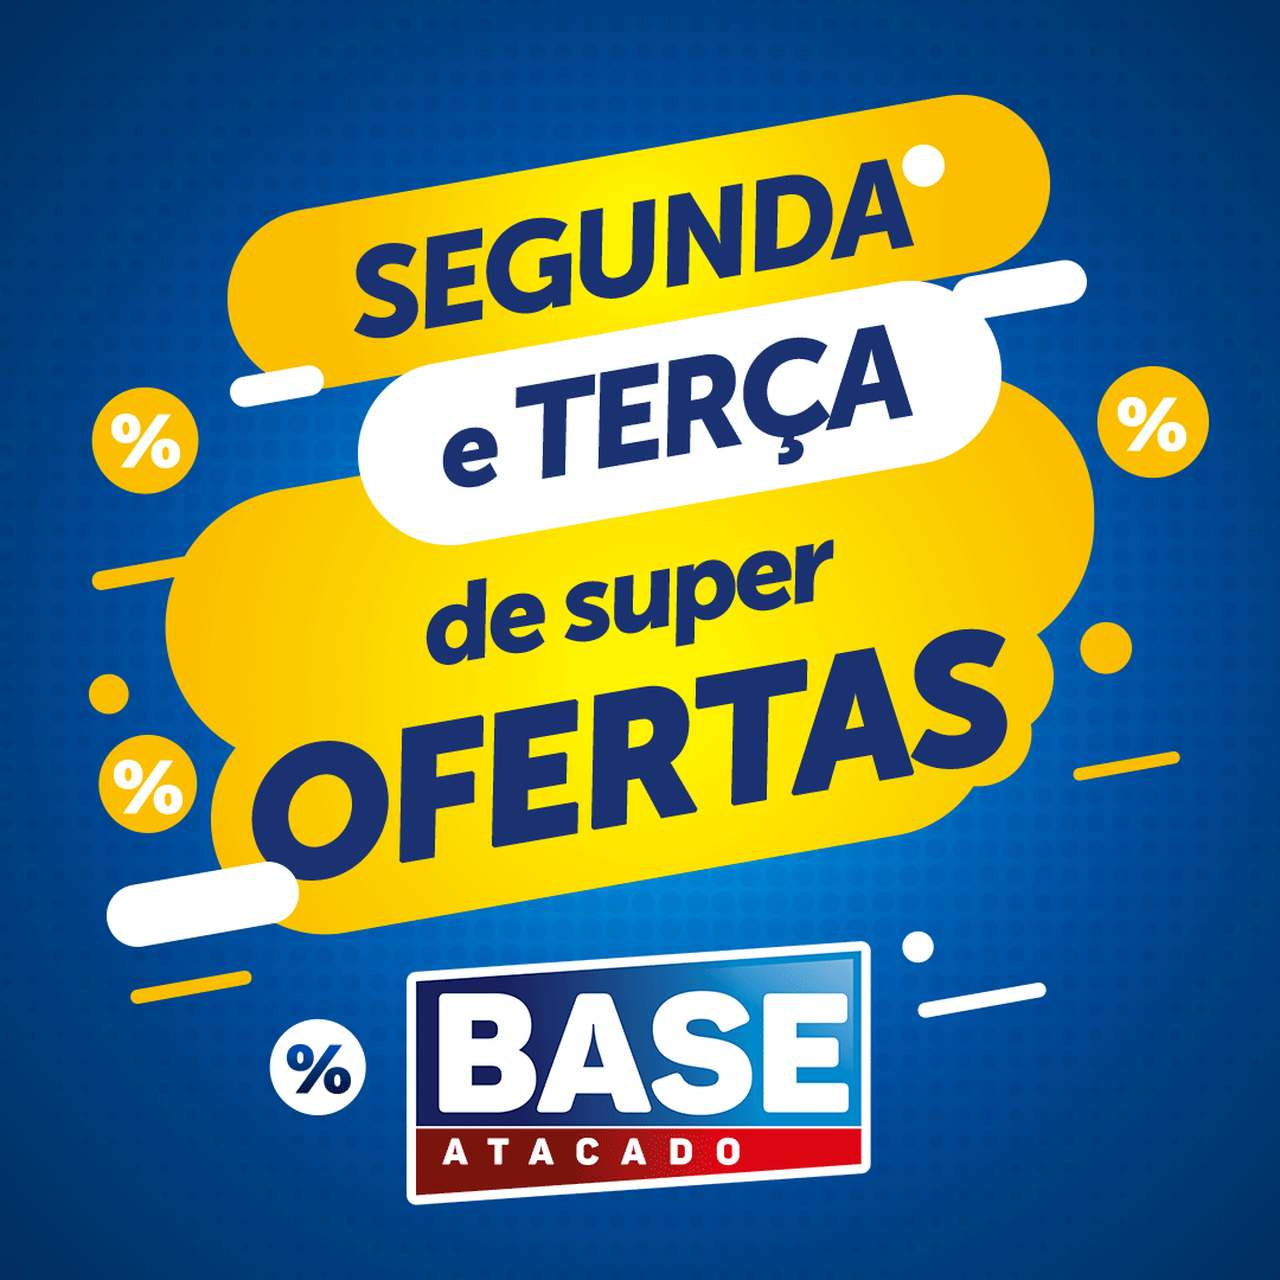 Ofertas de supermercado BASE atacado segunda e terça de super ofertas vence 29-09-1